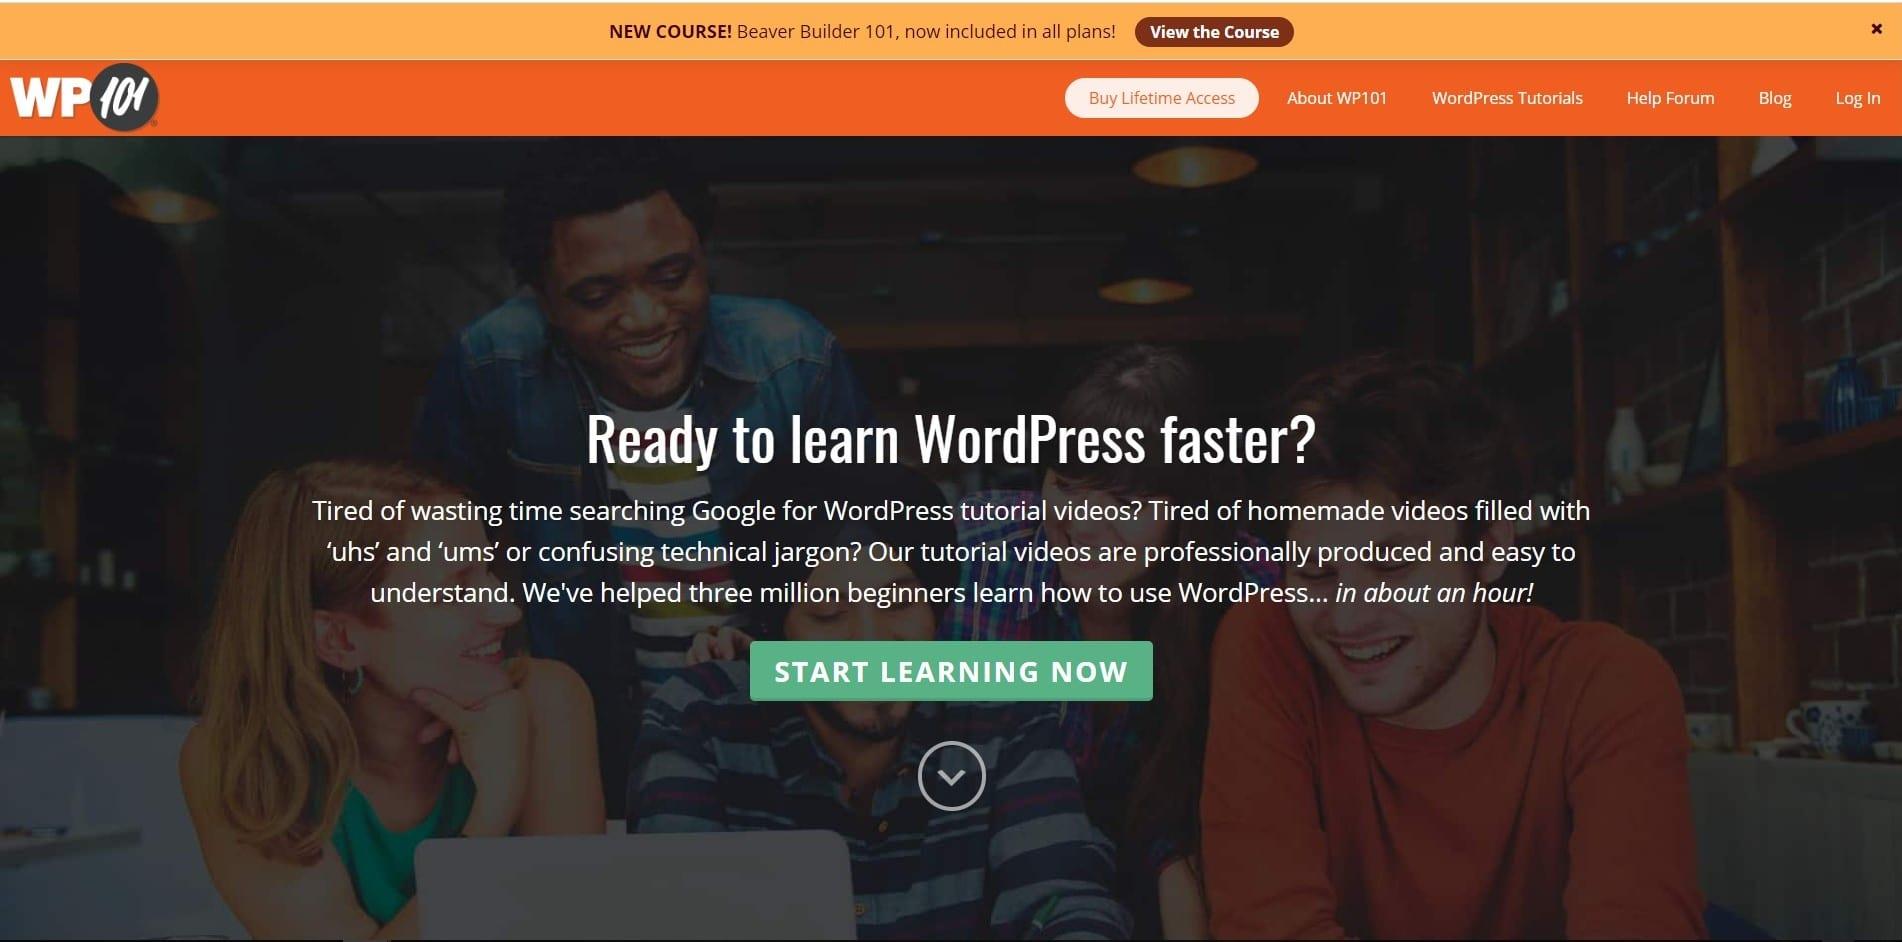 Learn WordPress with WP101